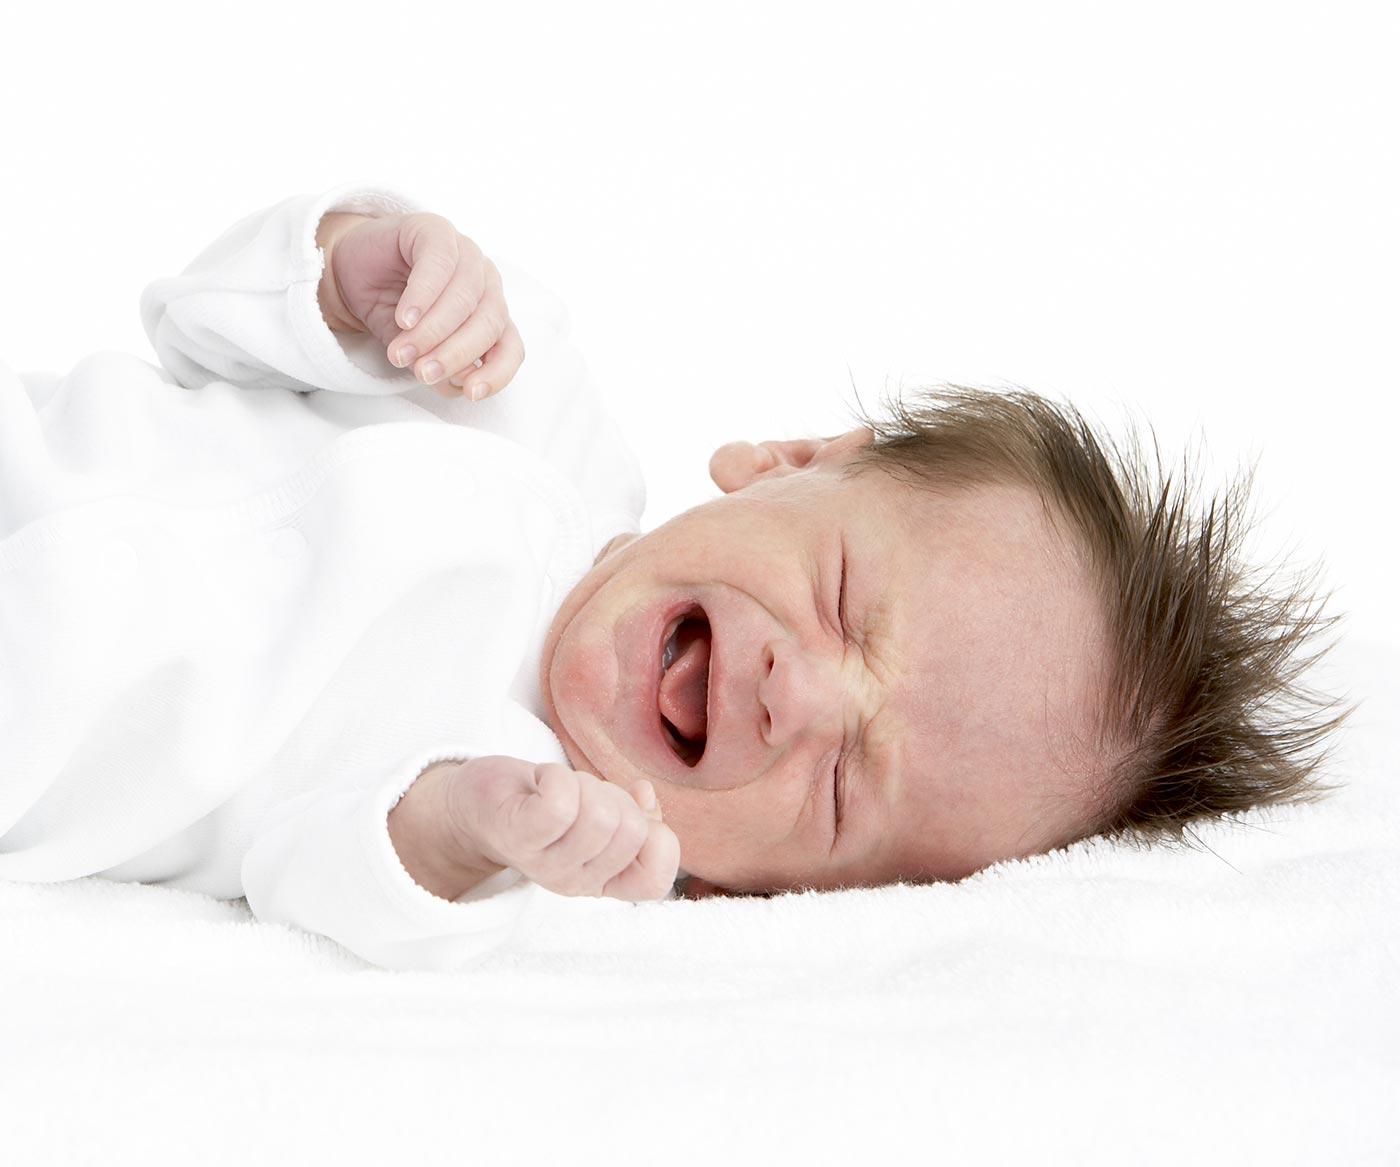 Newborn fights sleep